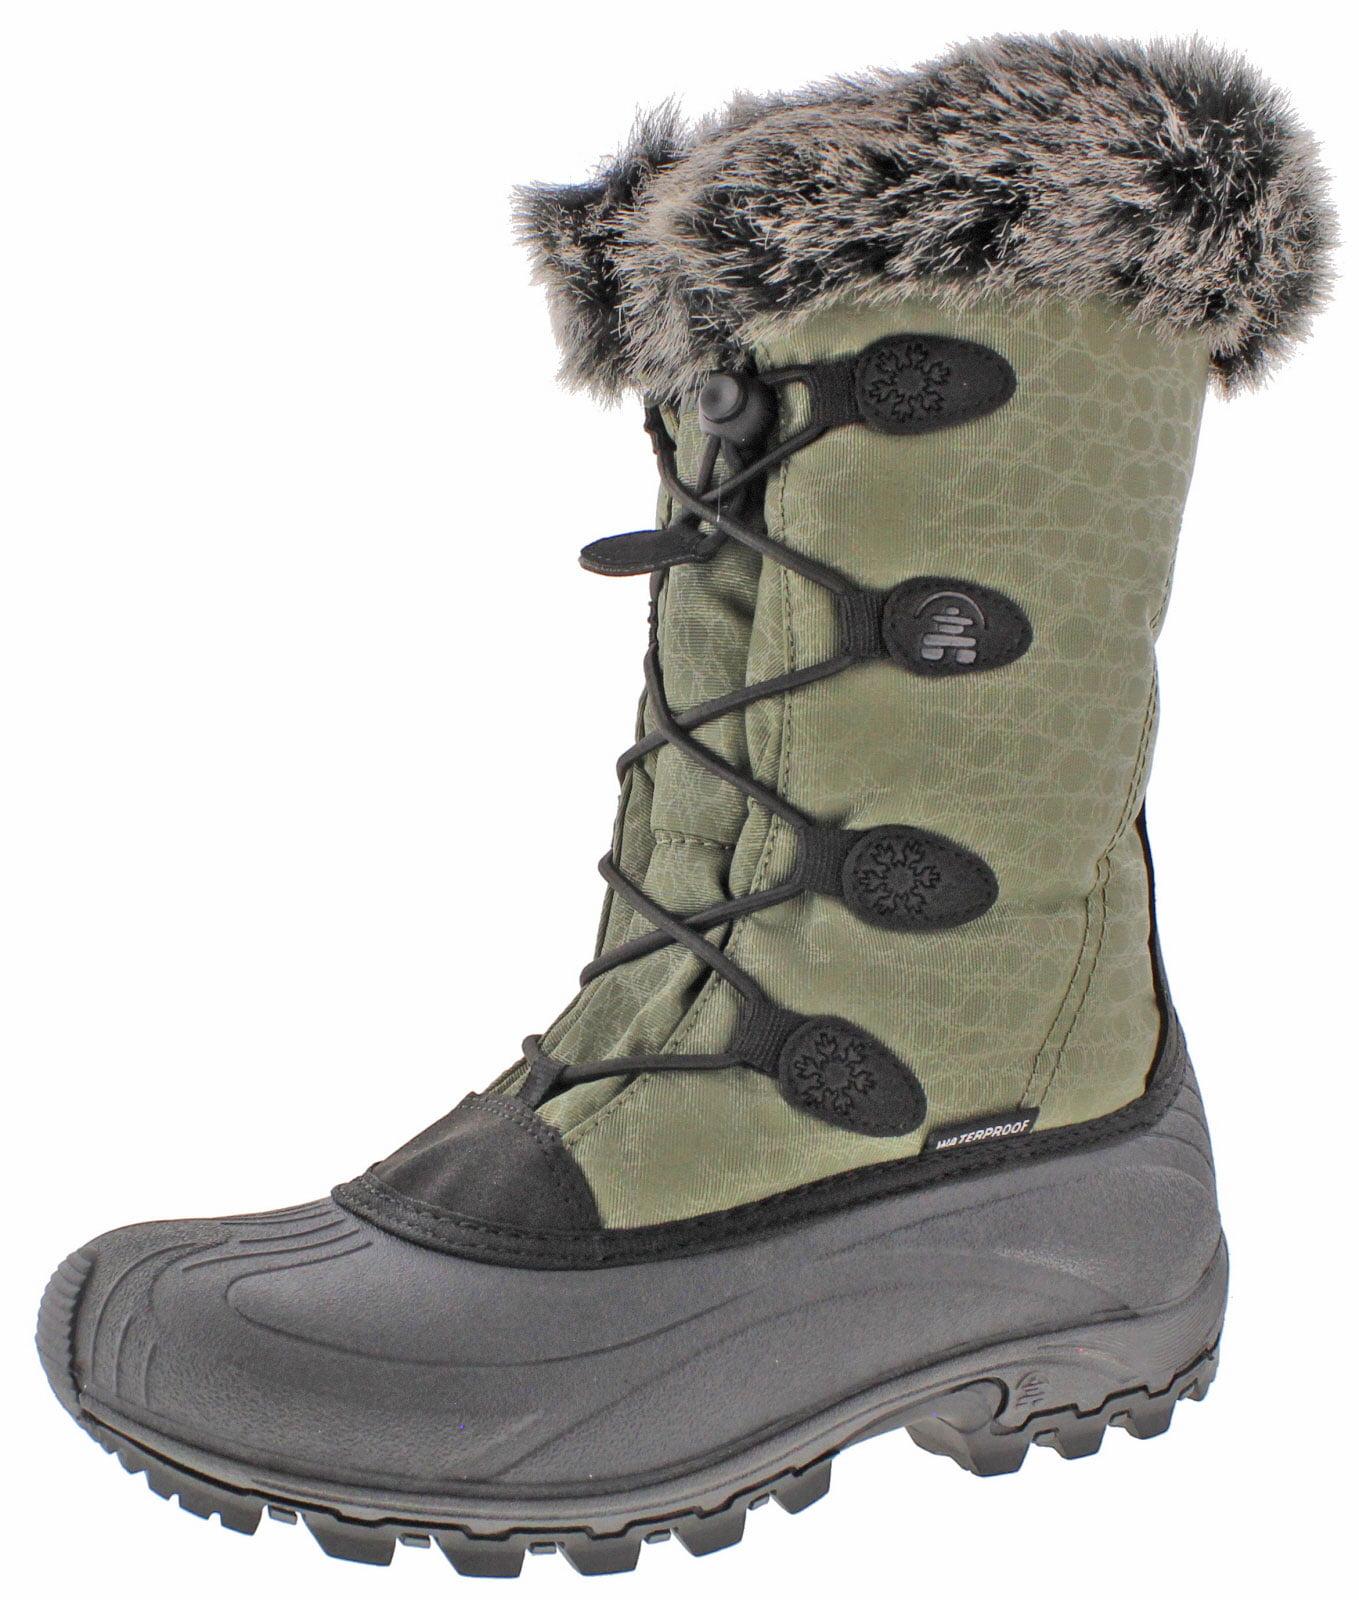 Kamik Momentum Women's Waterproof Nylon Snow Boots by